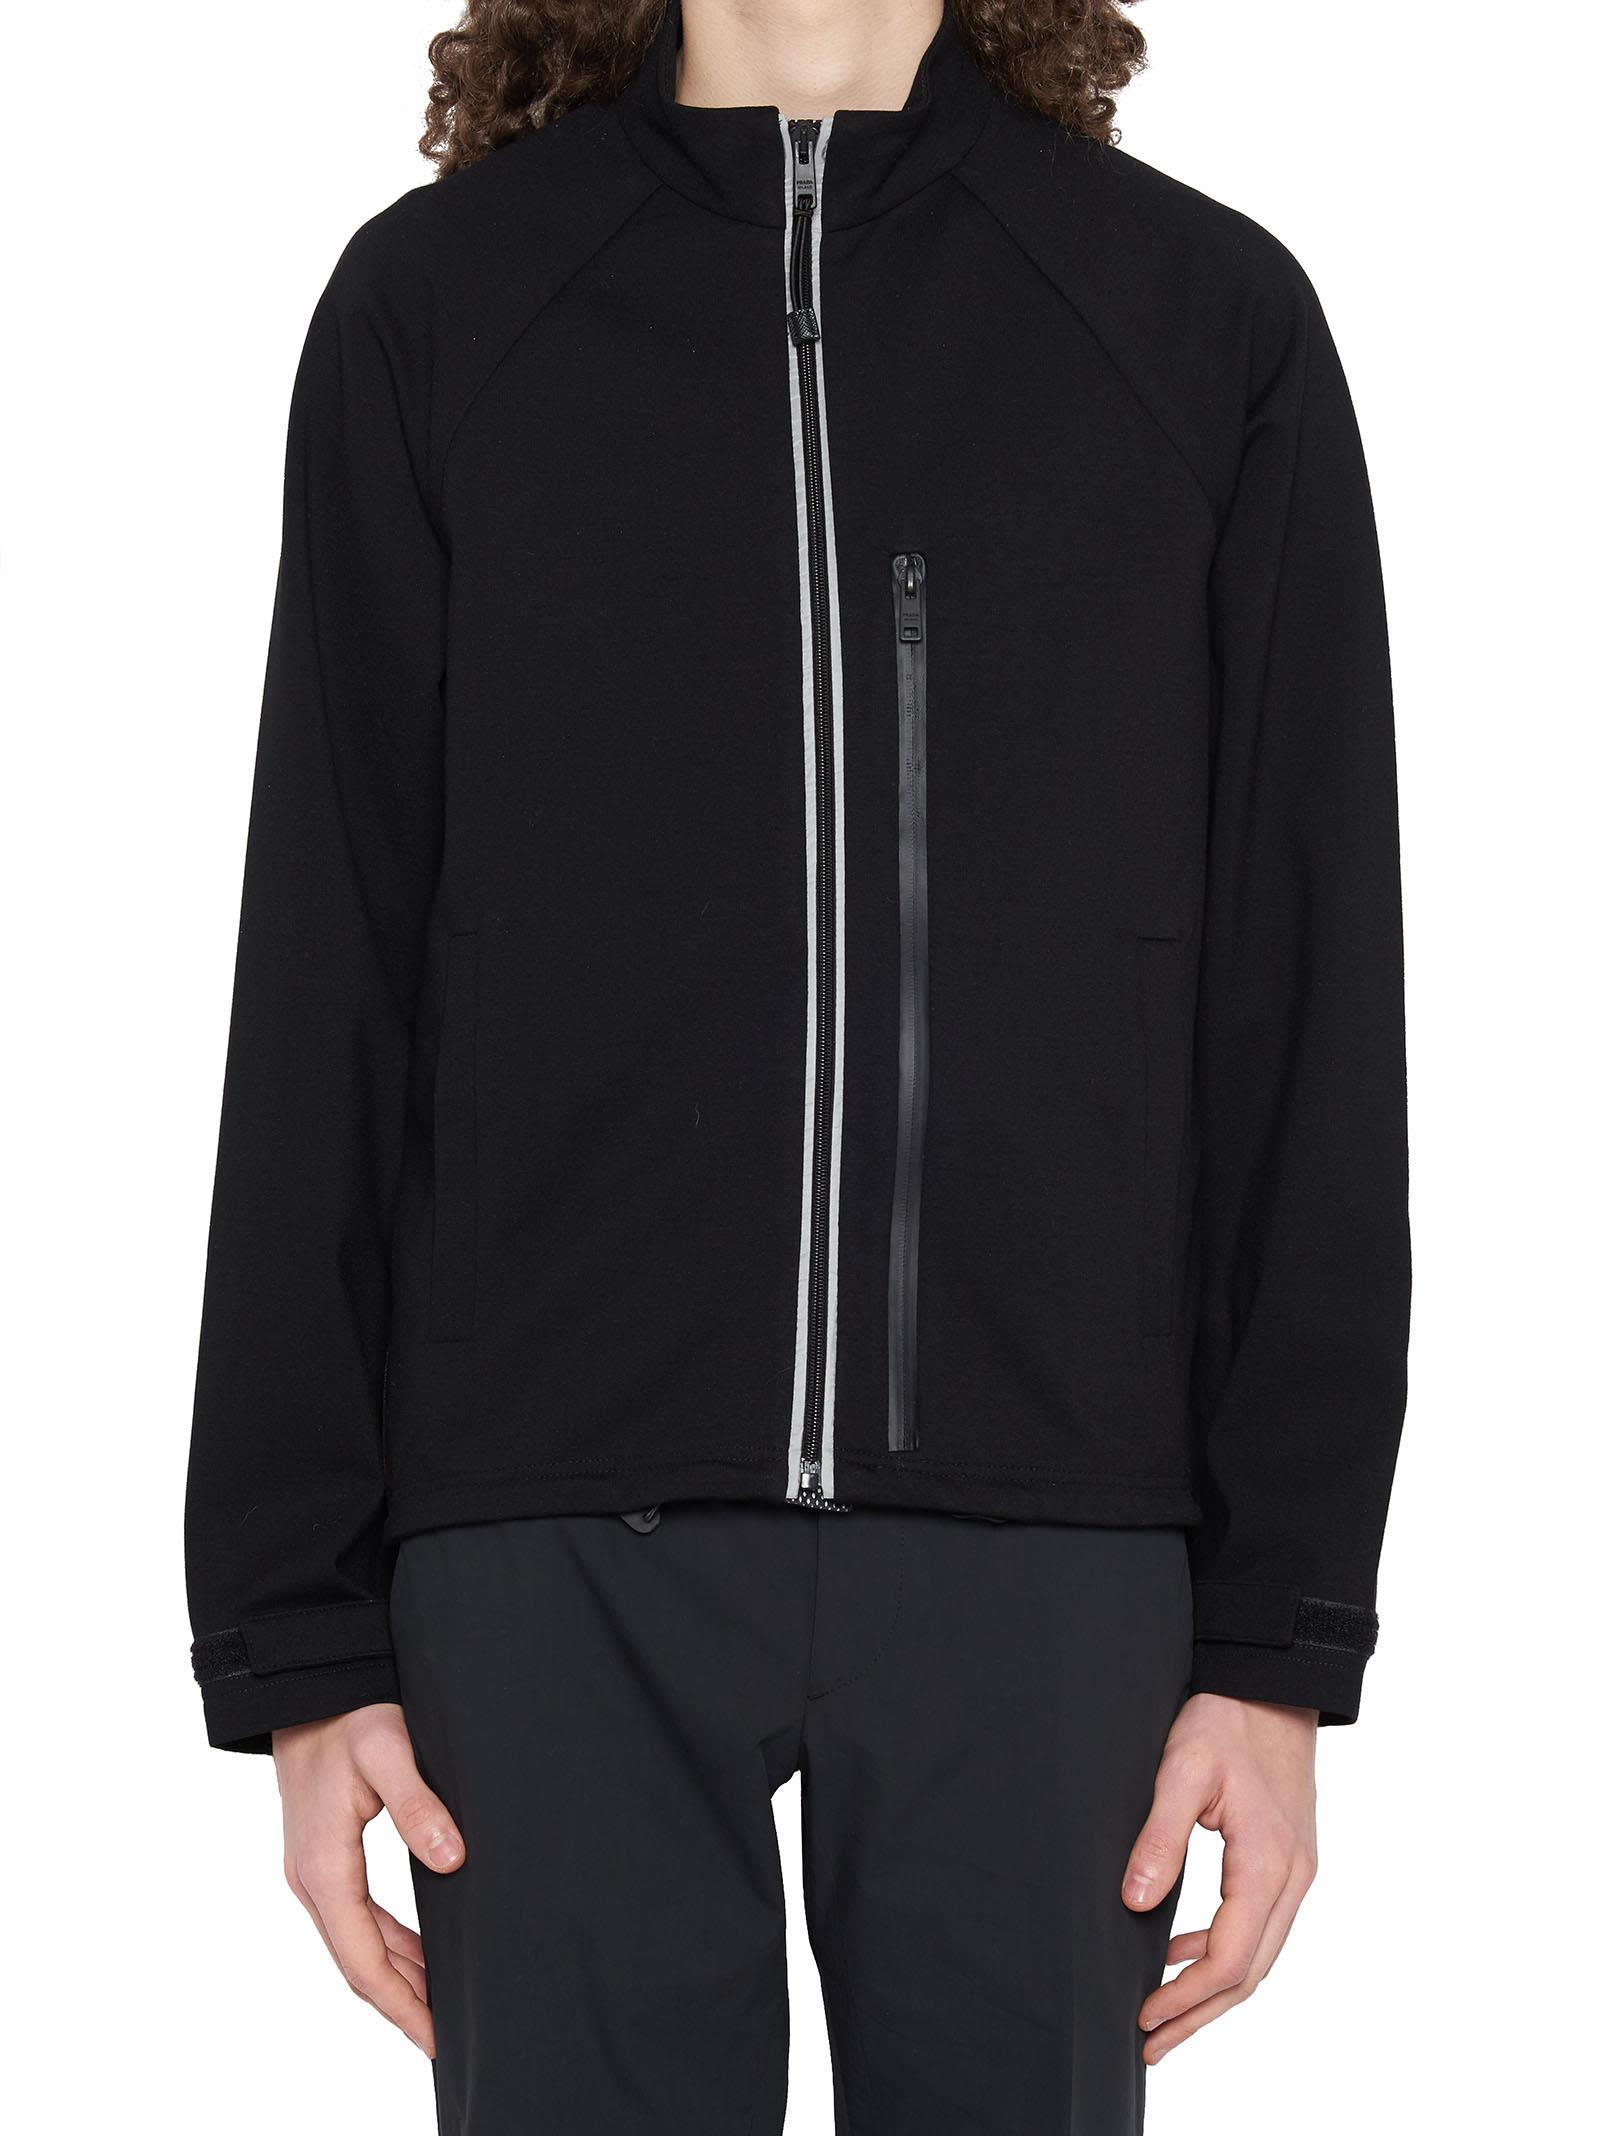 Prada Linea Rossa Sweatshirt